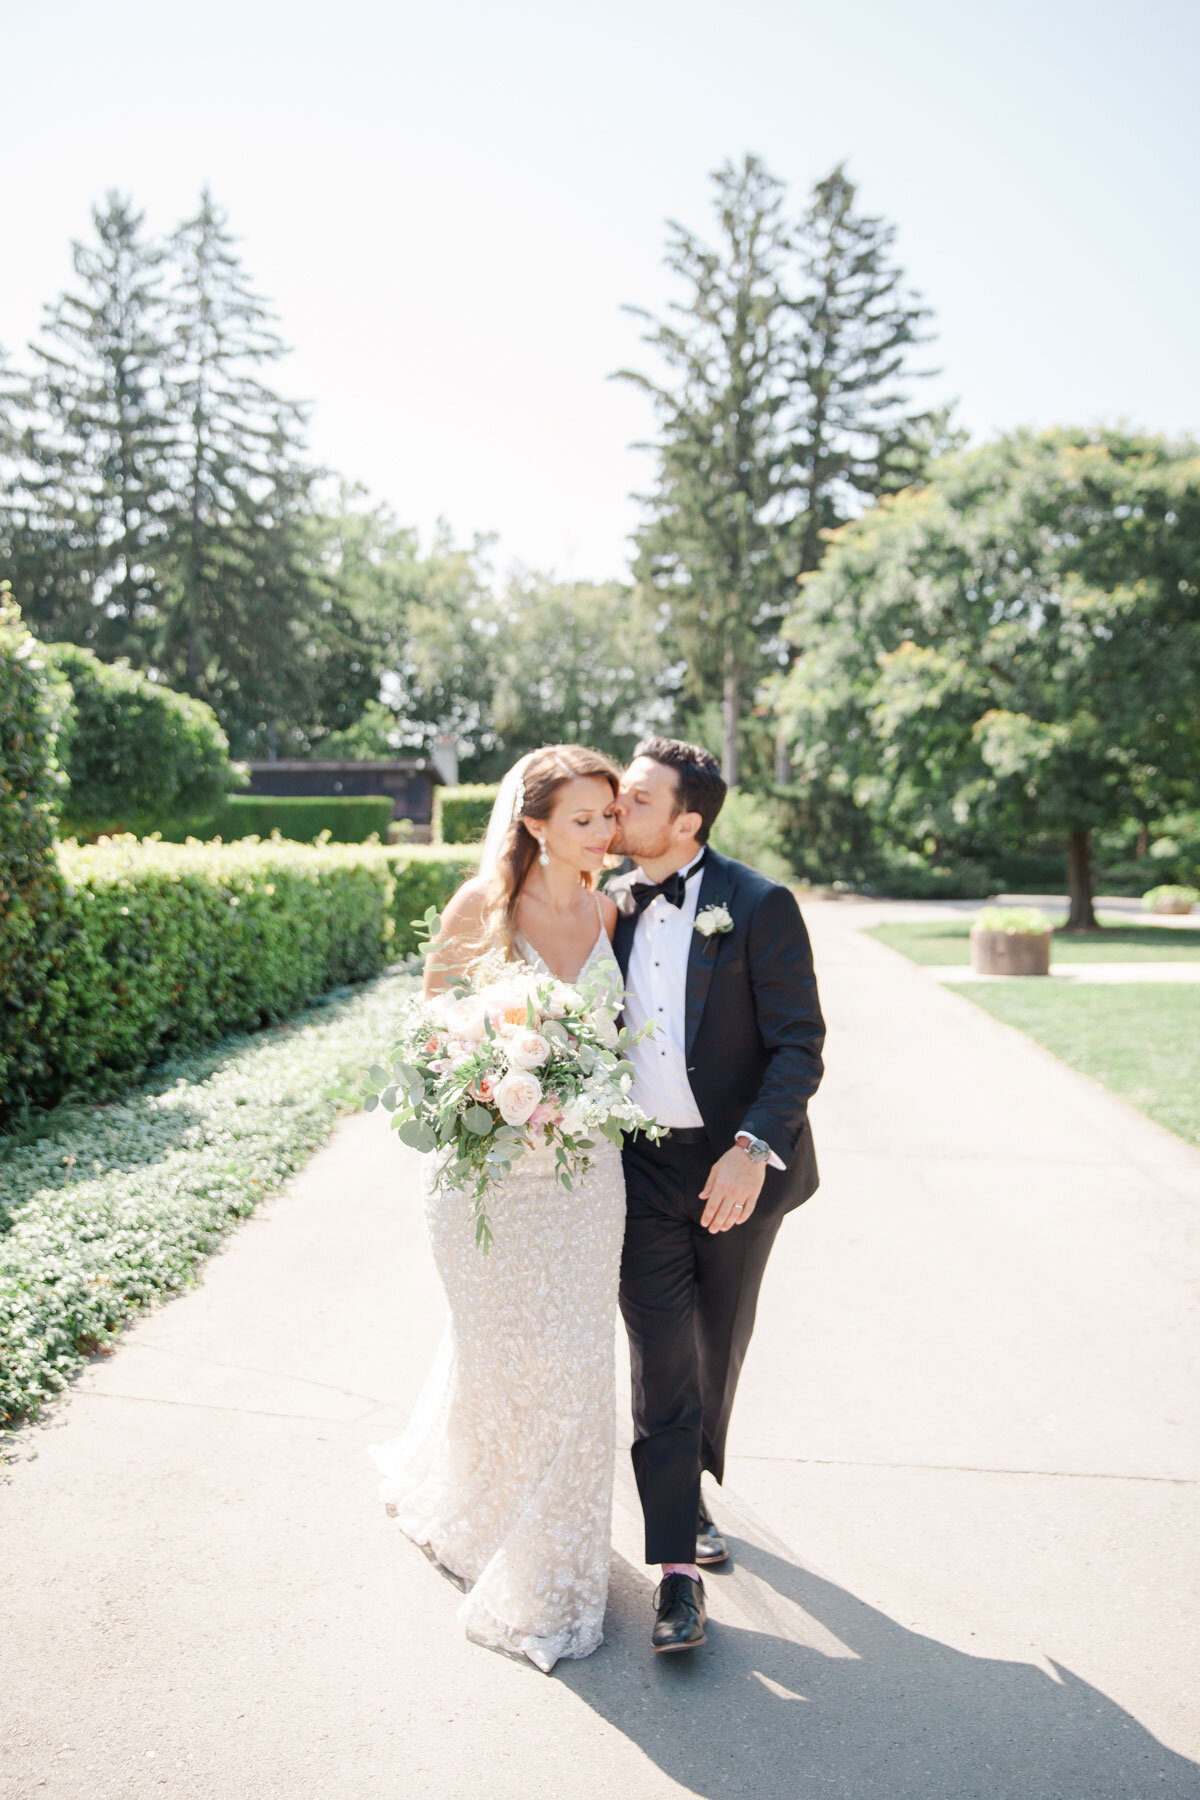 Chateau-des-Charmes-Wedding-Summer-Vineyard-Bride-Niagara-on-the-Lake-photos-by-Gemini-Photography-Ontario-0026.jpg